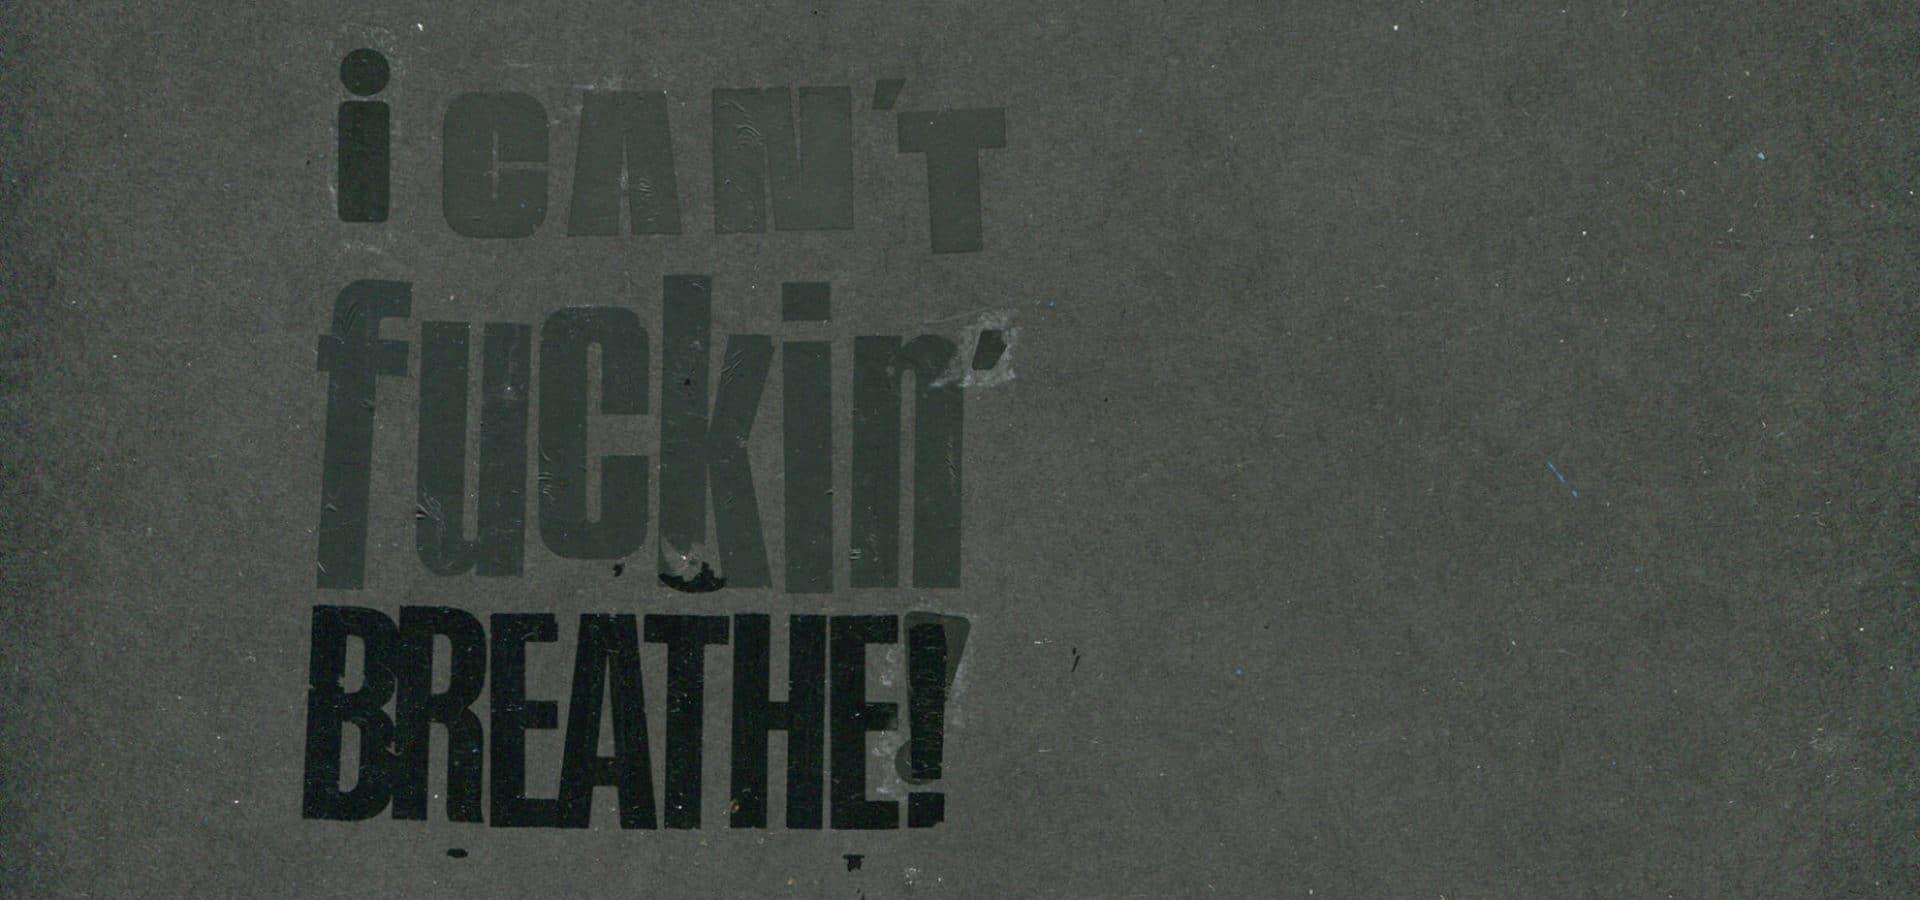 I Can't Fuckin' Breathe, Collage by Tasheka Arceneaux